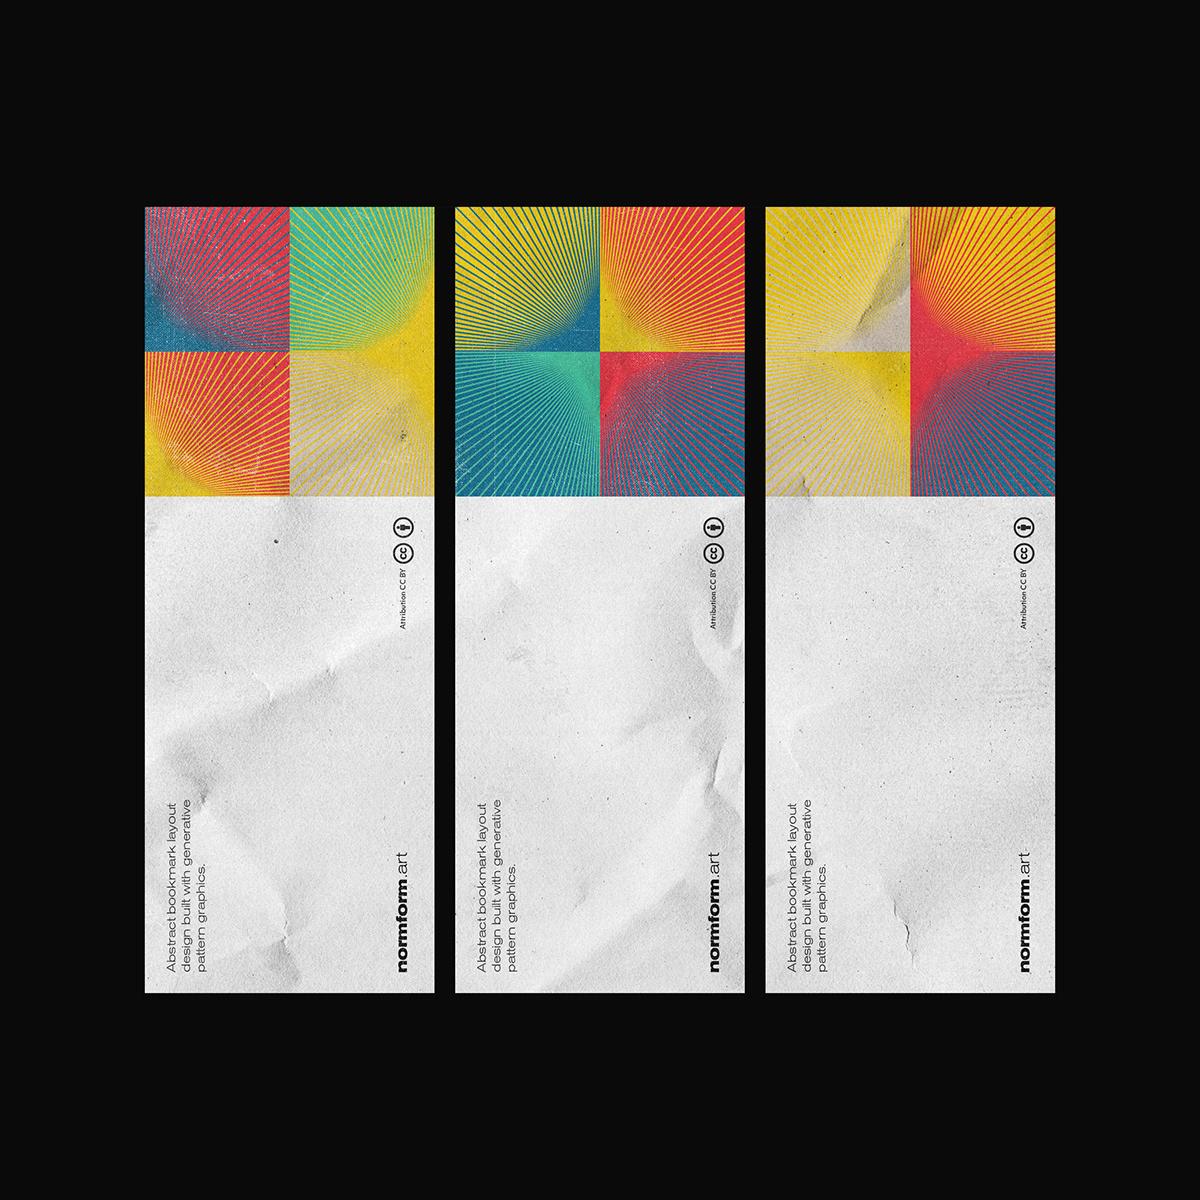 abstract art bauhaus design generative geometric pattern poster swiss typography